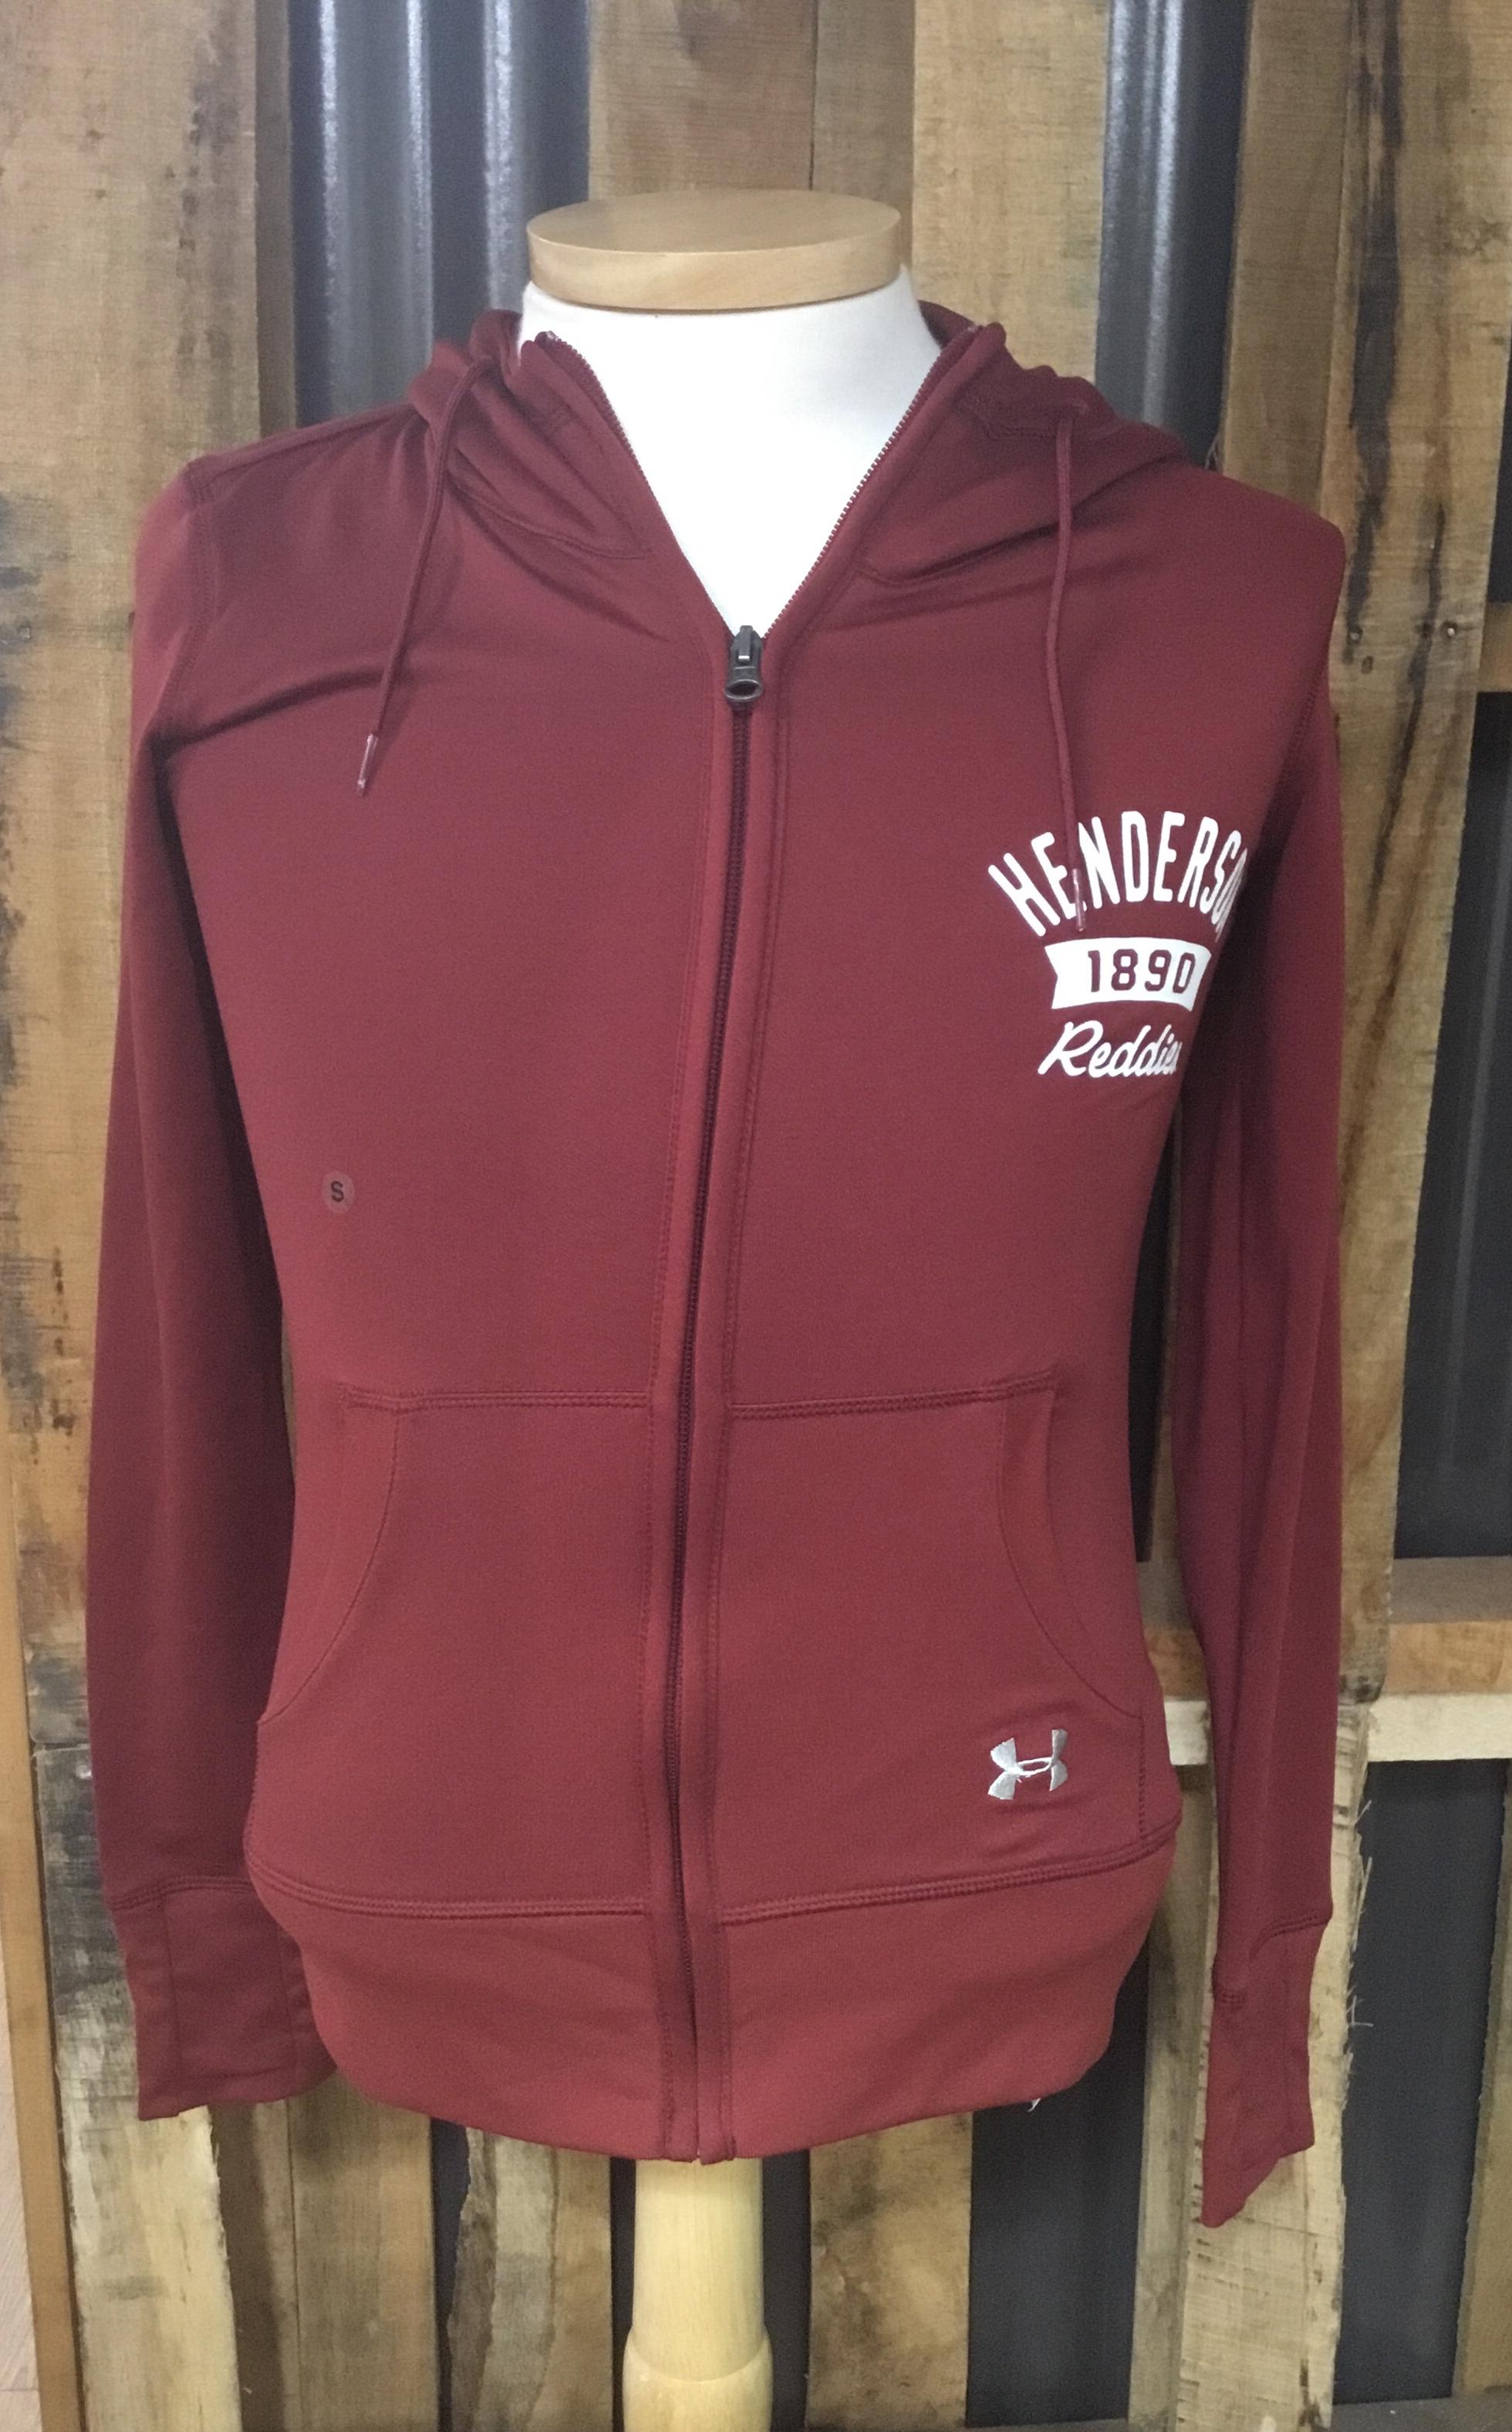 image of: Under Armour Henderson Reddies 1890 Jacket